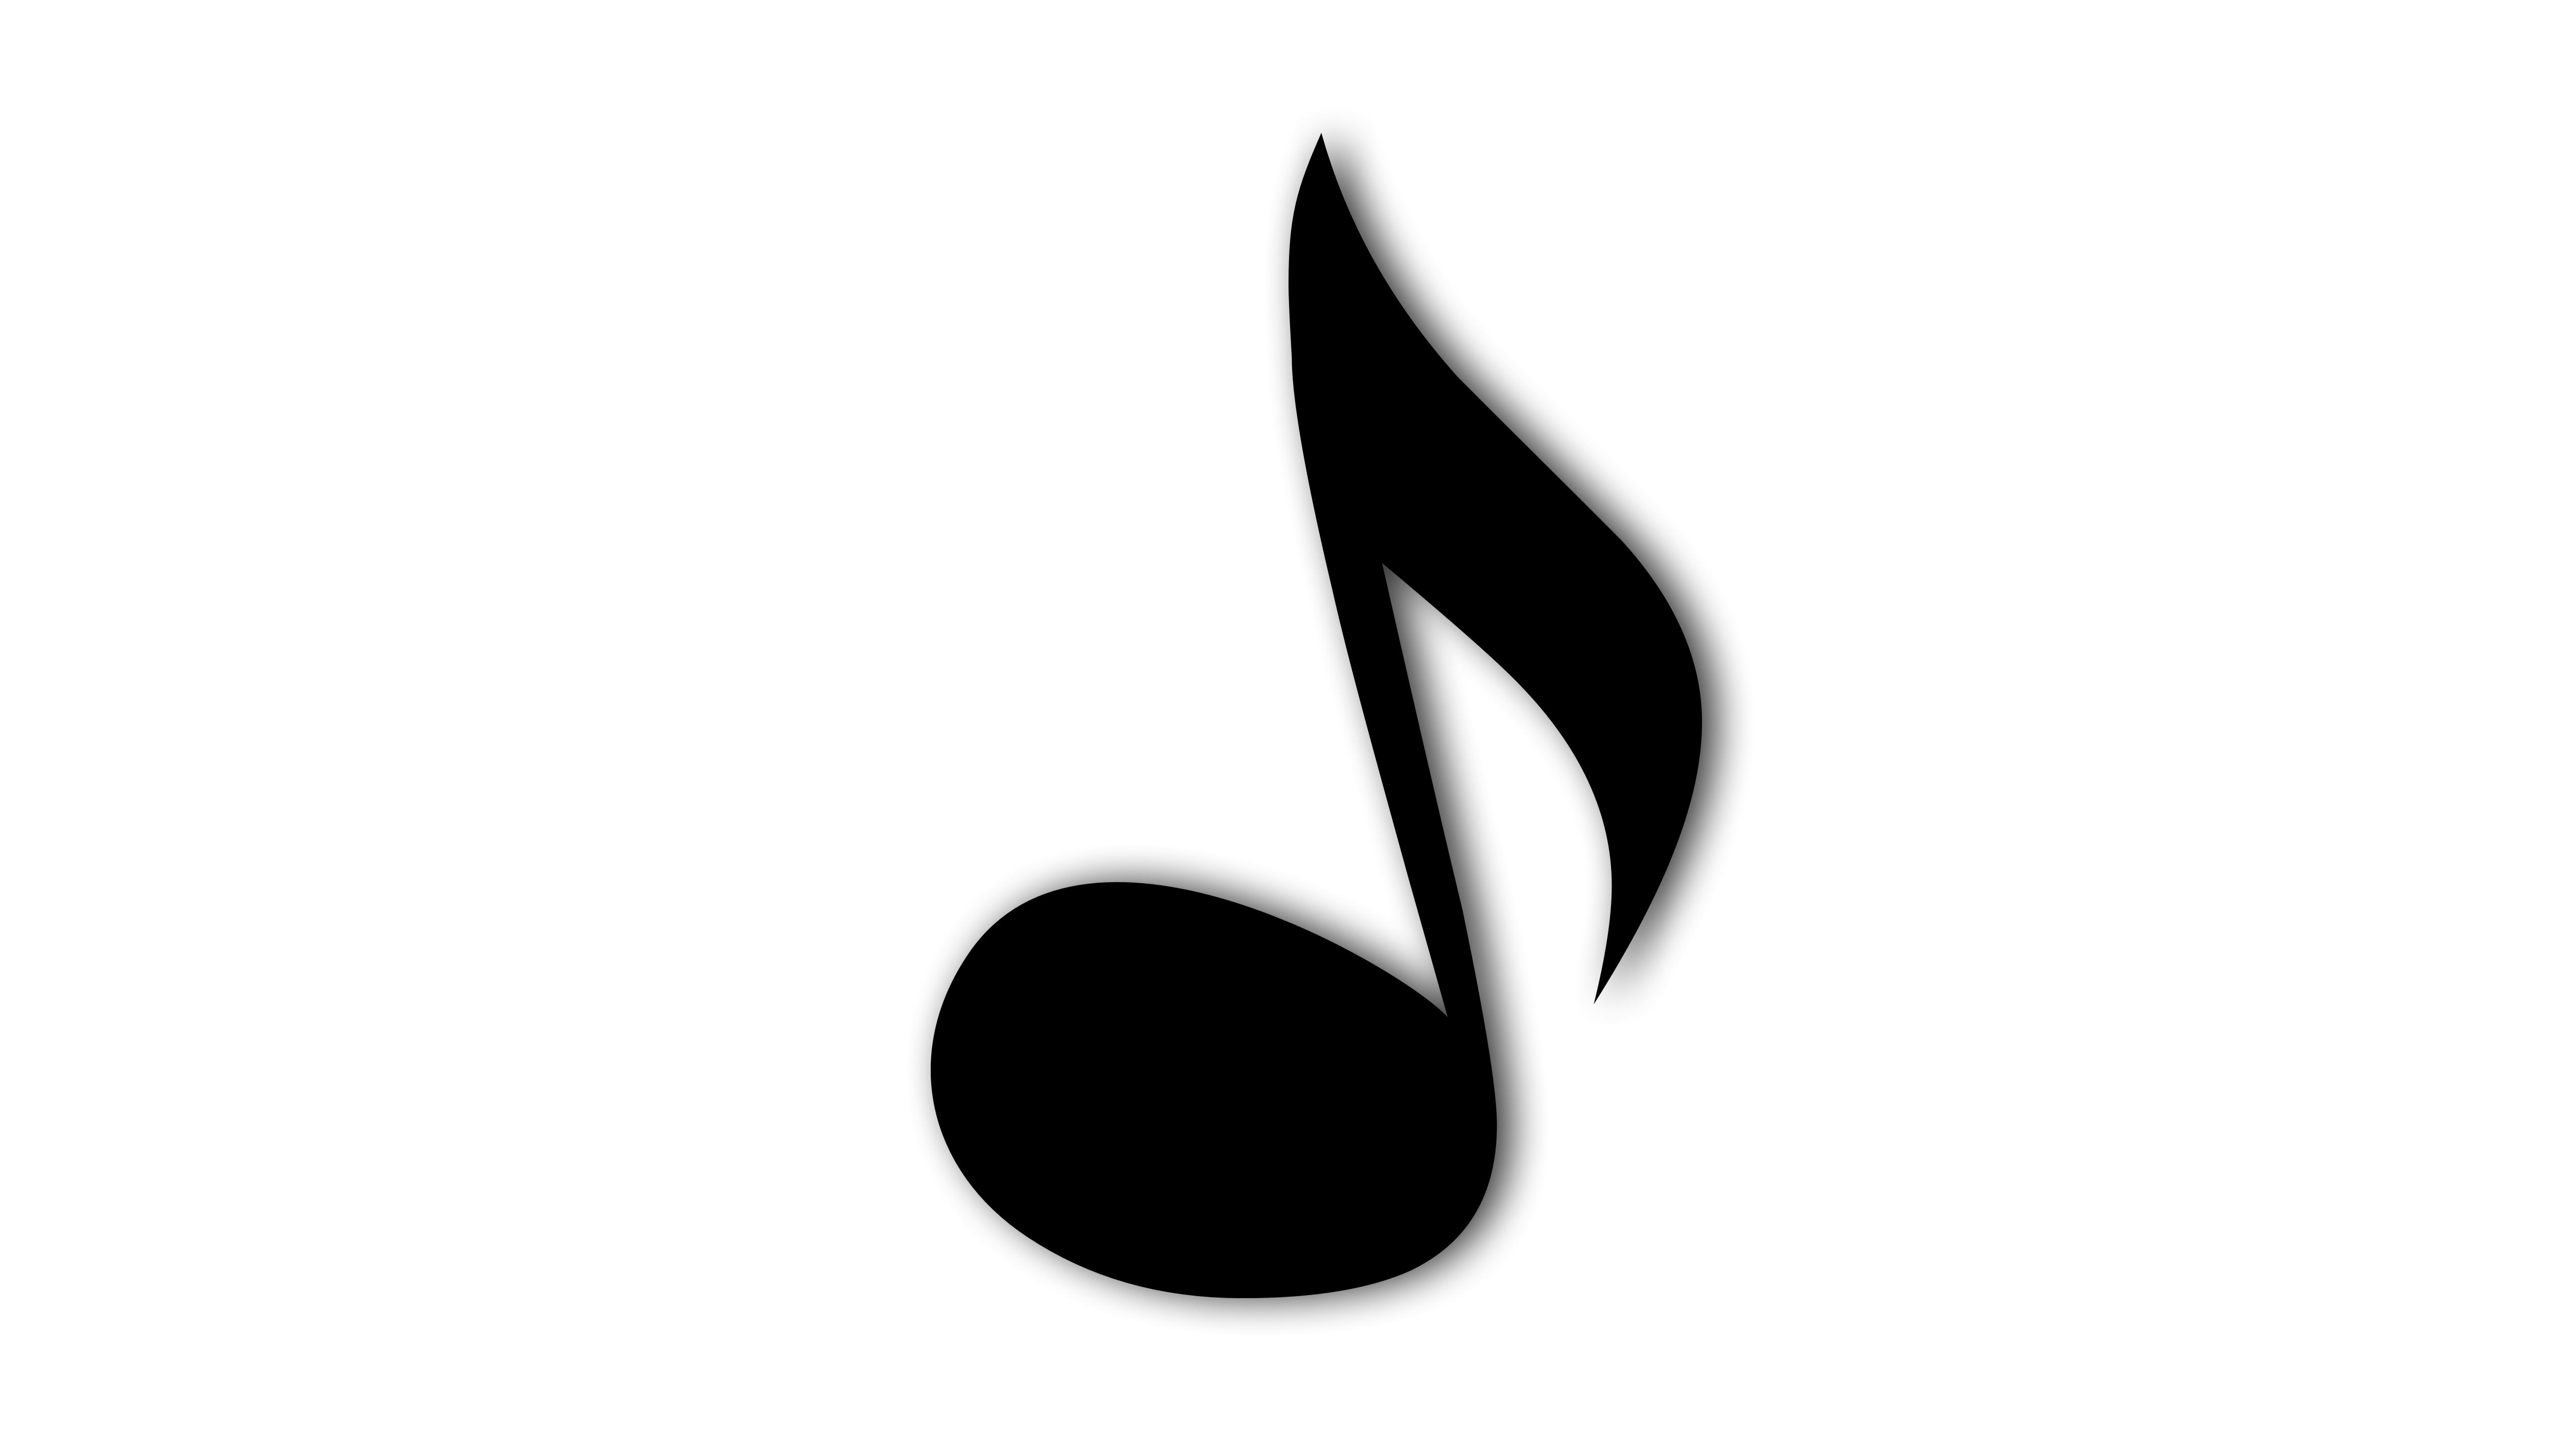 Music notes symbols names free download best music notes symbols 5040x2800 angie wilkin buycottarizona